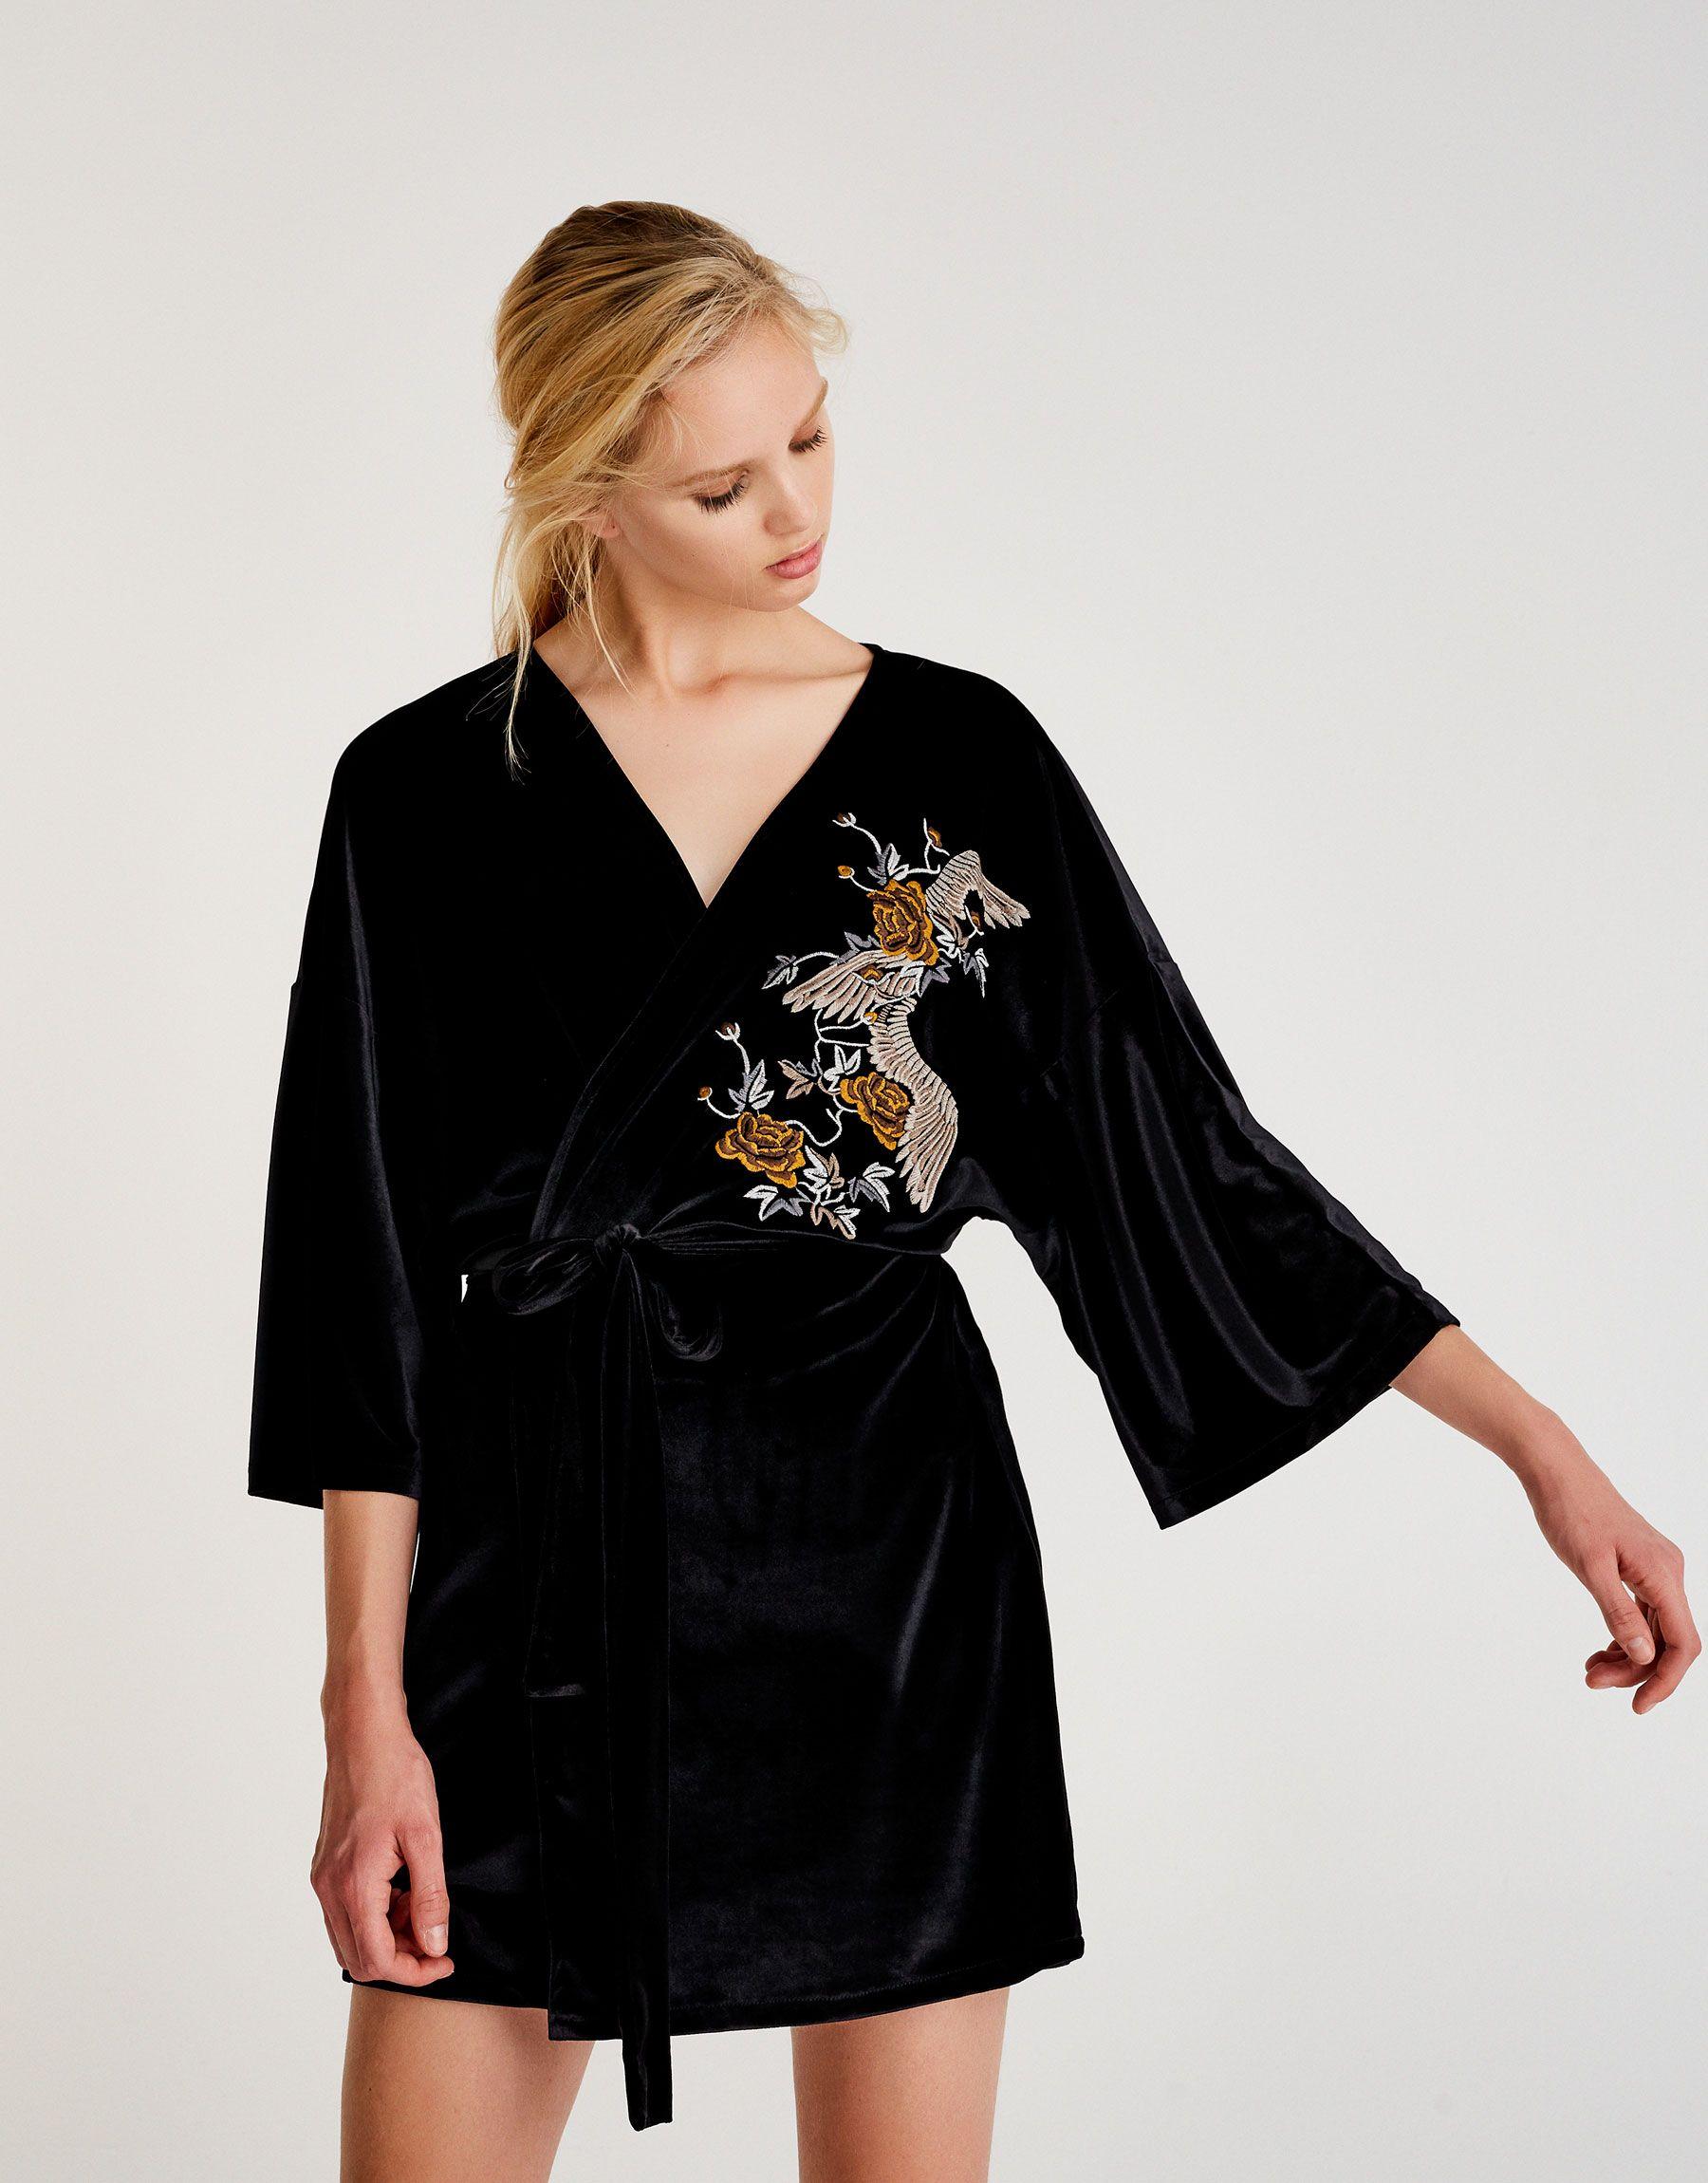 Embroidered velvet effect kimono   Coats and jackets   Clothing ...